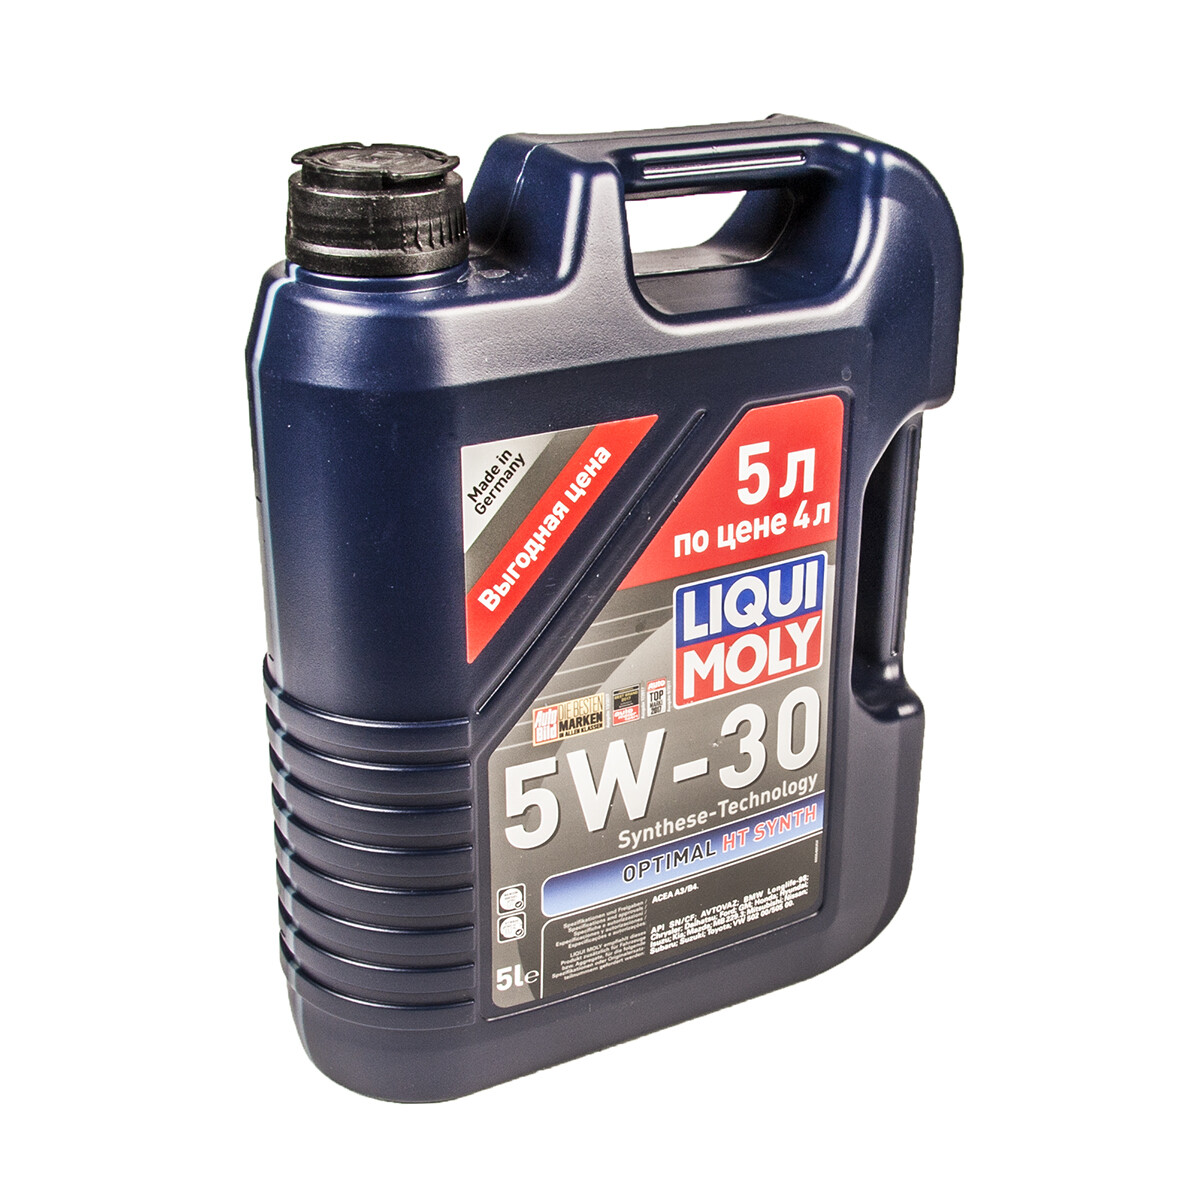 Моторное масло Optimal Synth 5W-30 SL/CF A3/B4 2292/39010 5л